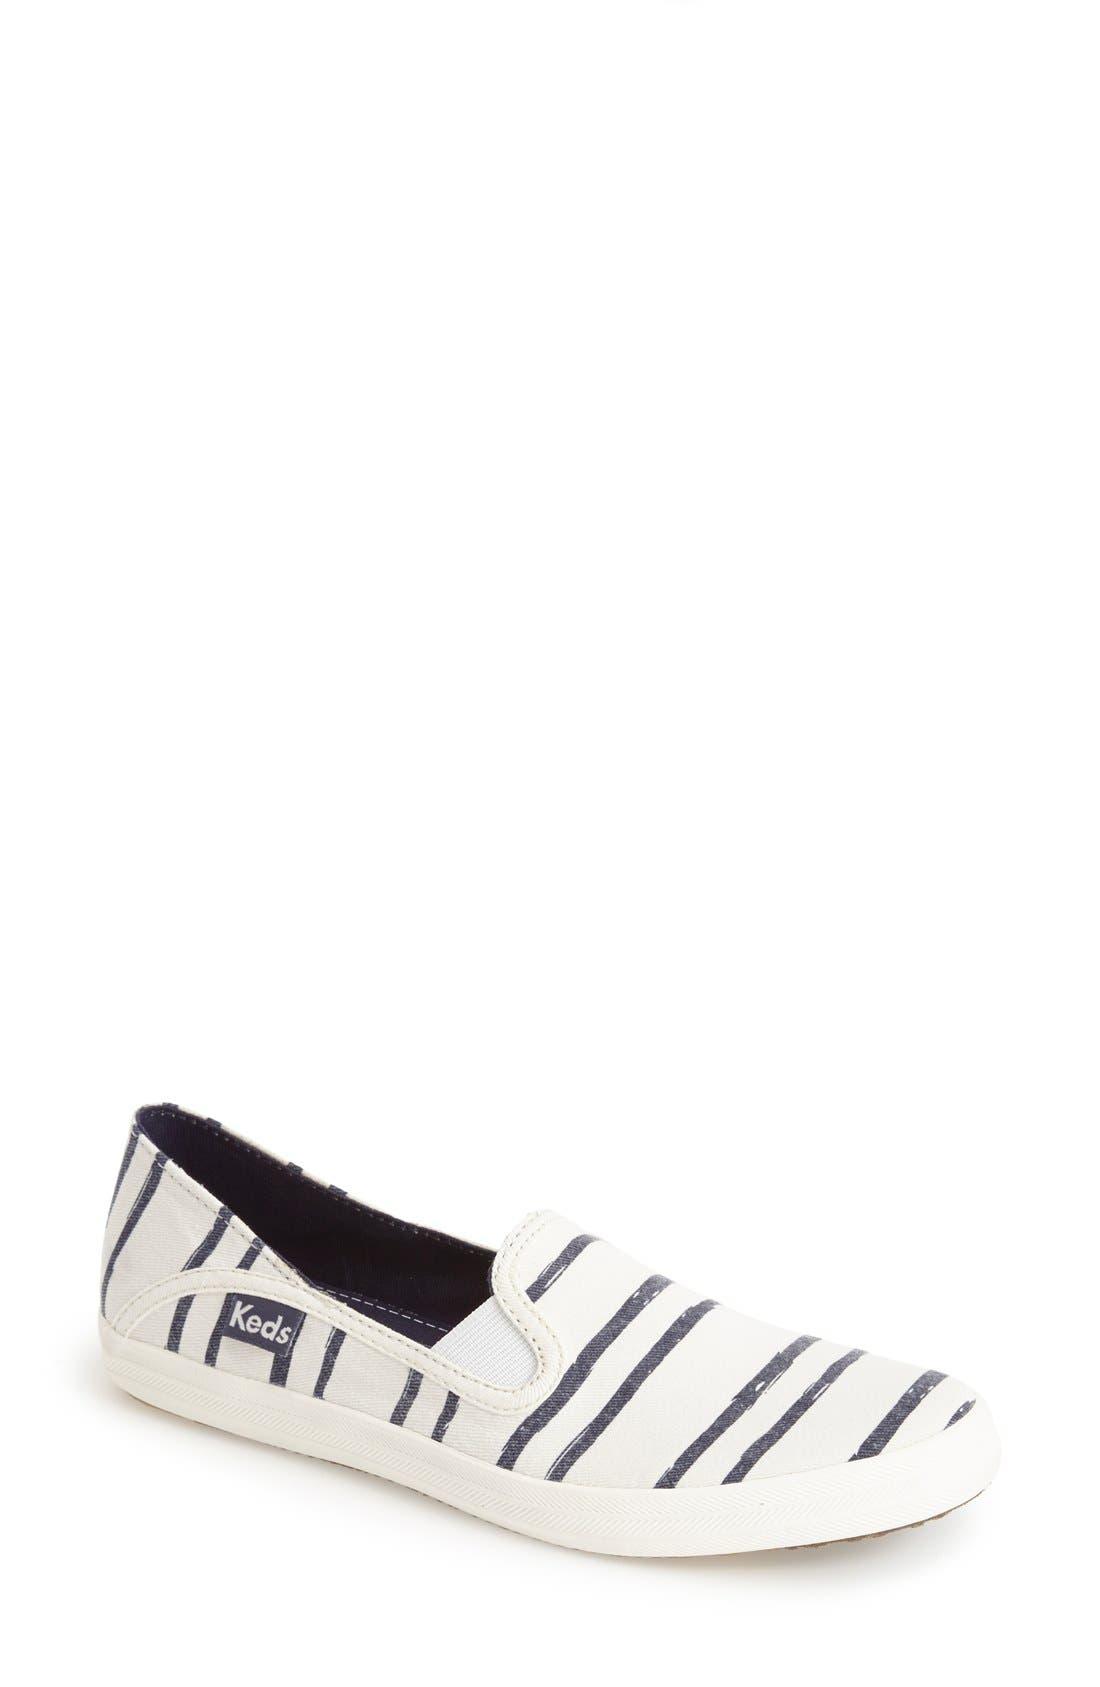 Alternate Image 1 Selected - Keds® 'Crashback - Washed Beach Stripe' Slip-On Sneaker (Women)